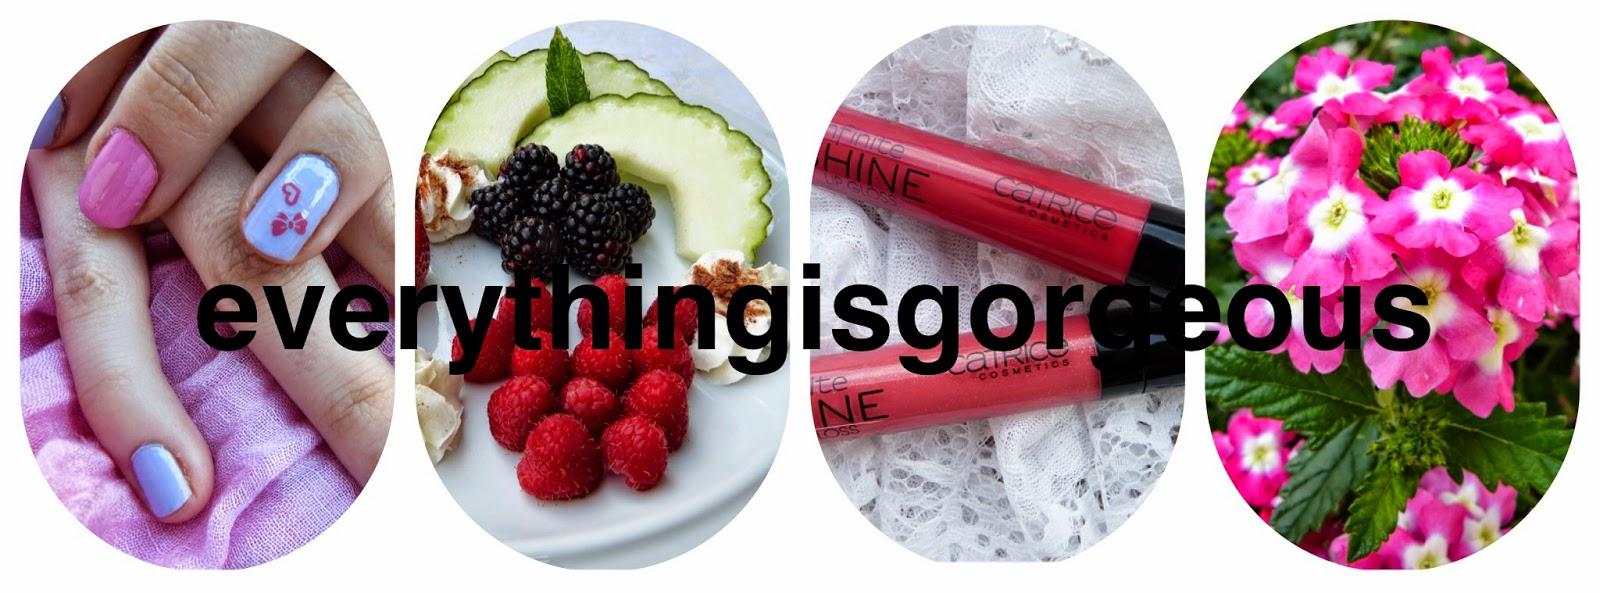 http://everythingisgorgeous.blogspot.de